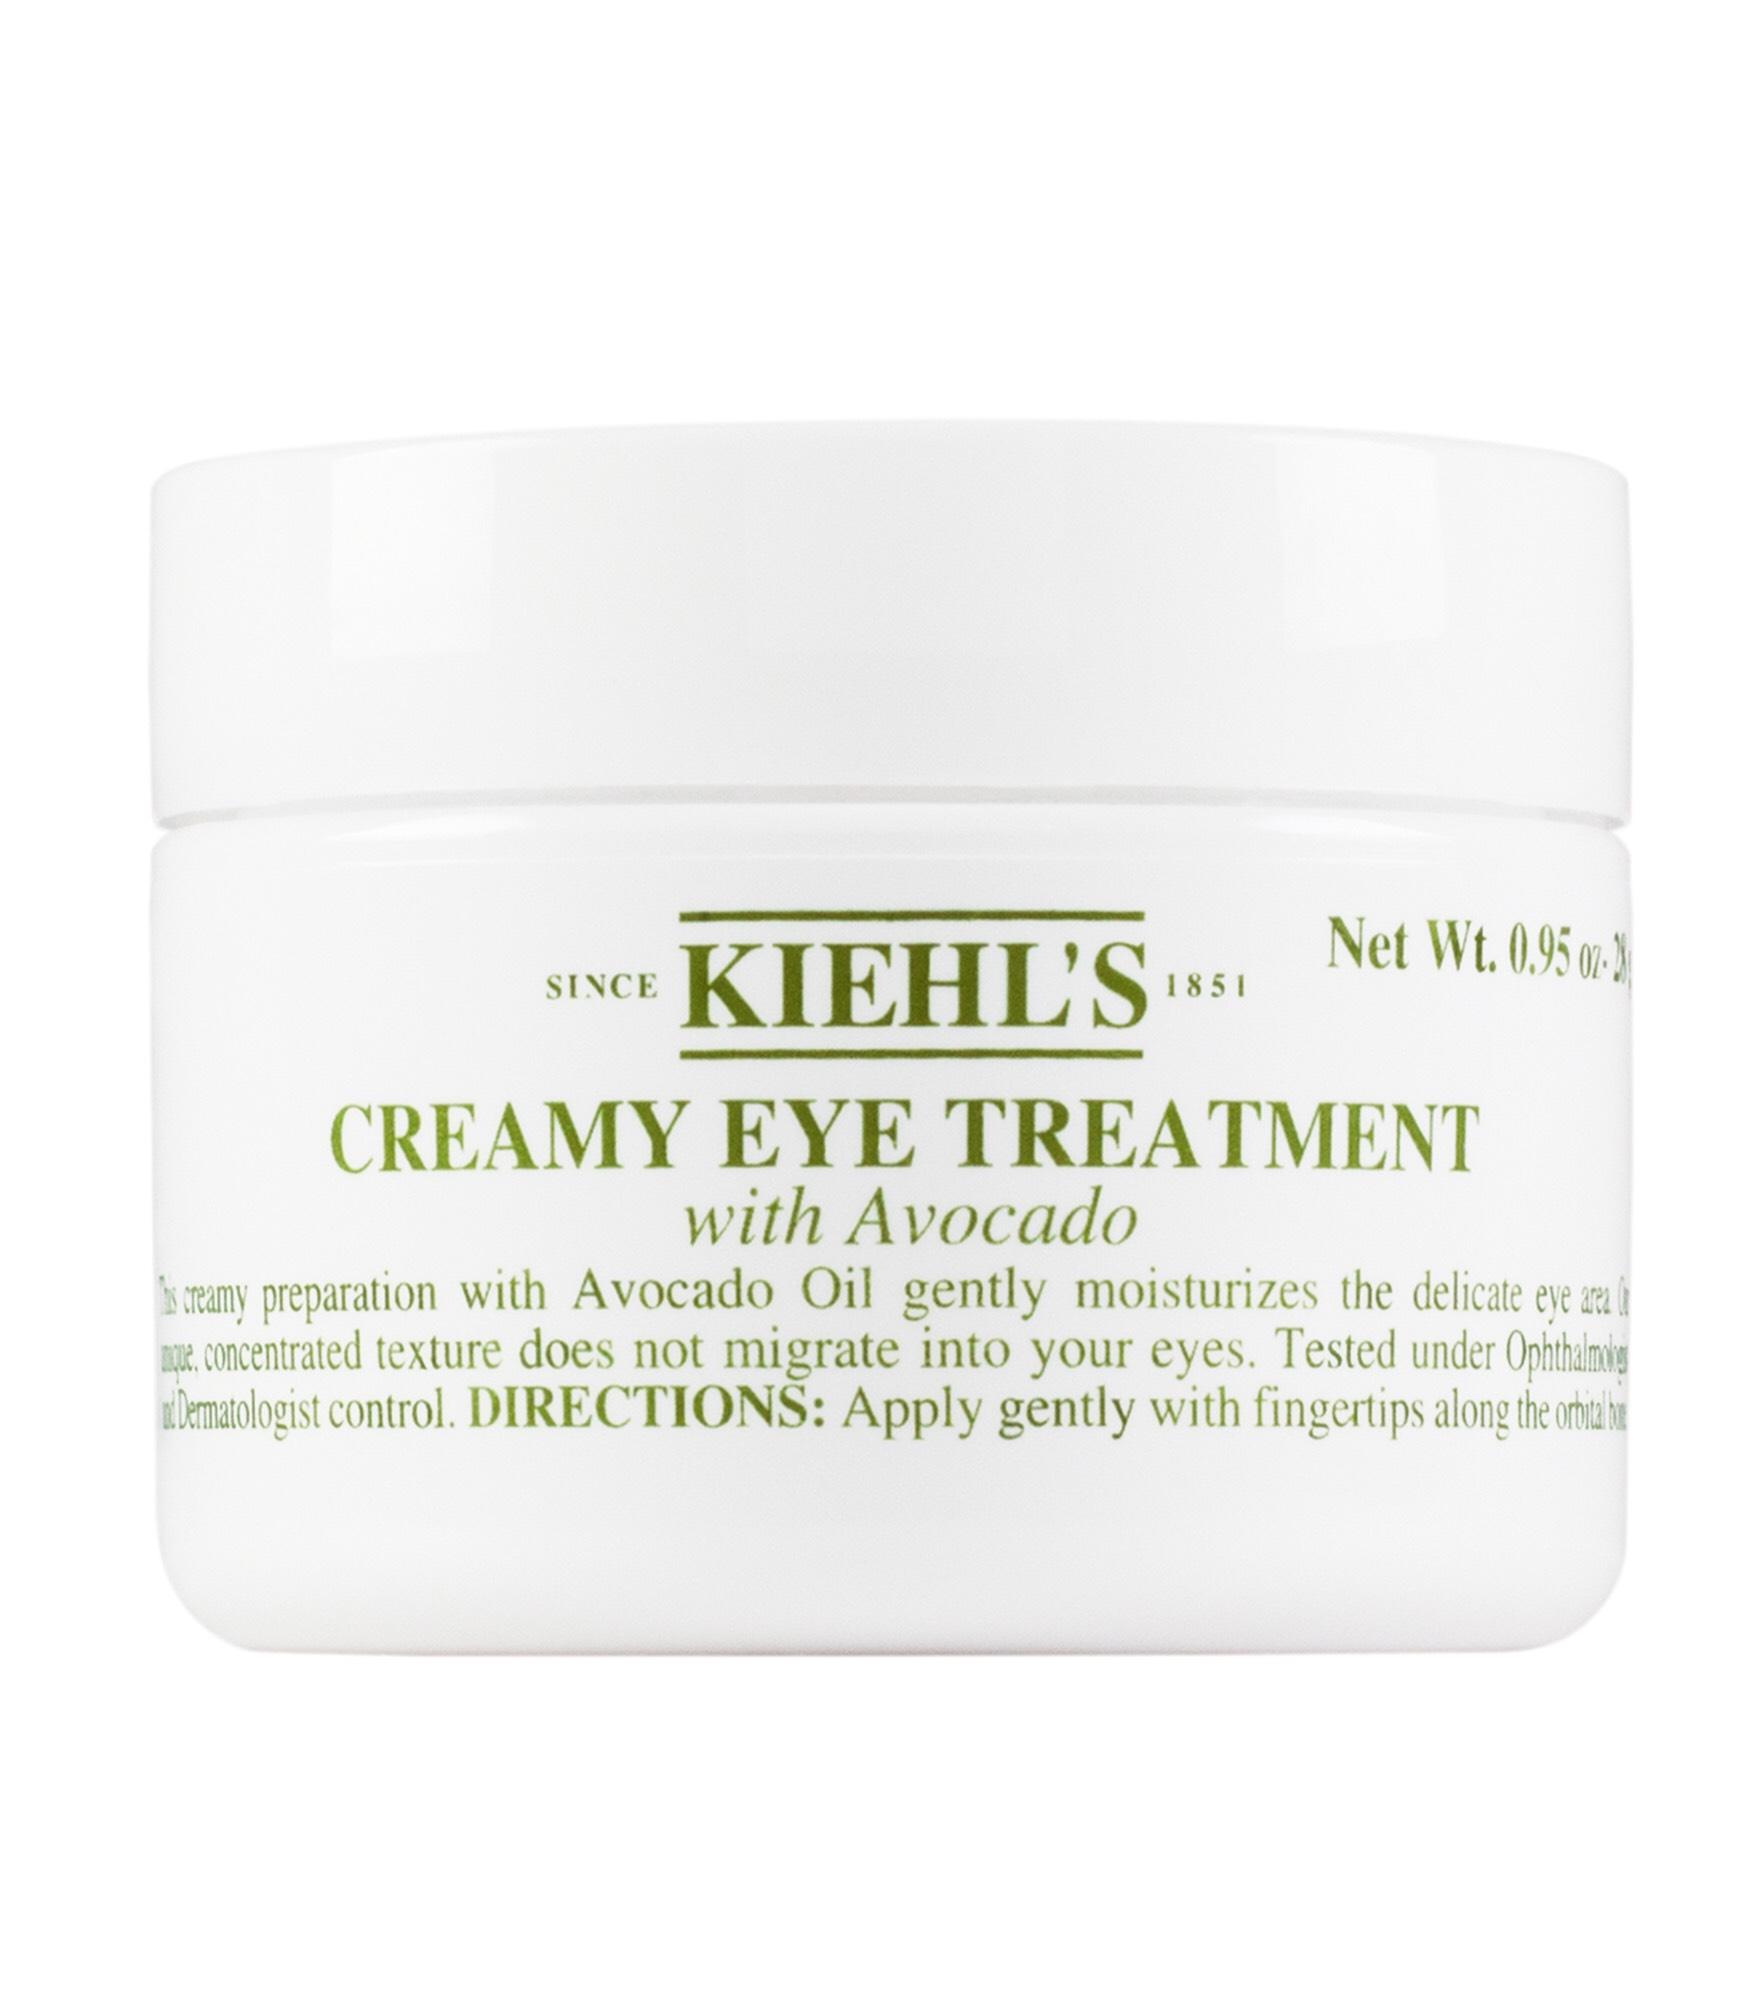 Creamy Eye Treatment with Avocado de Kiehls